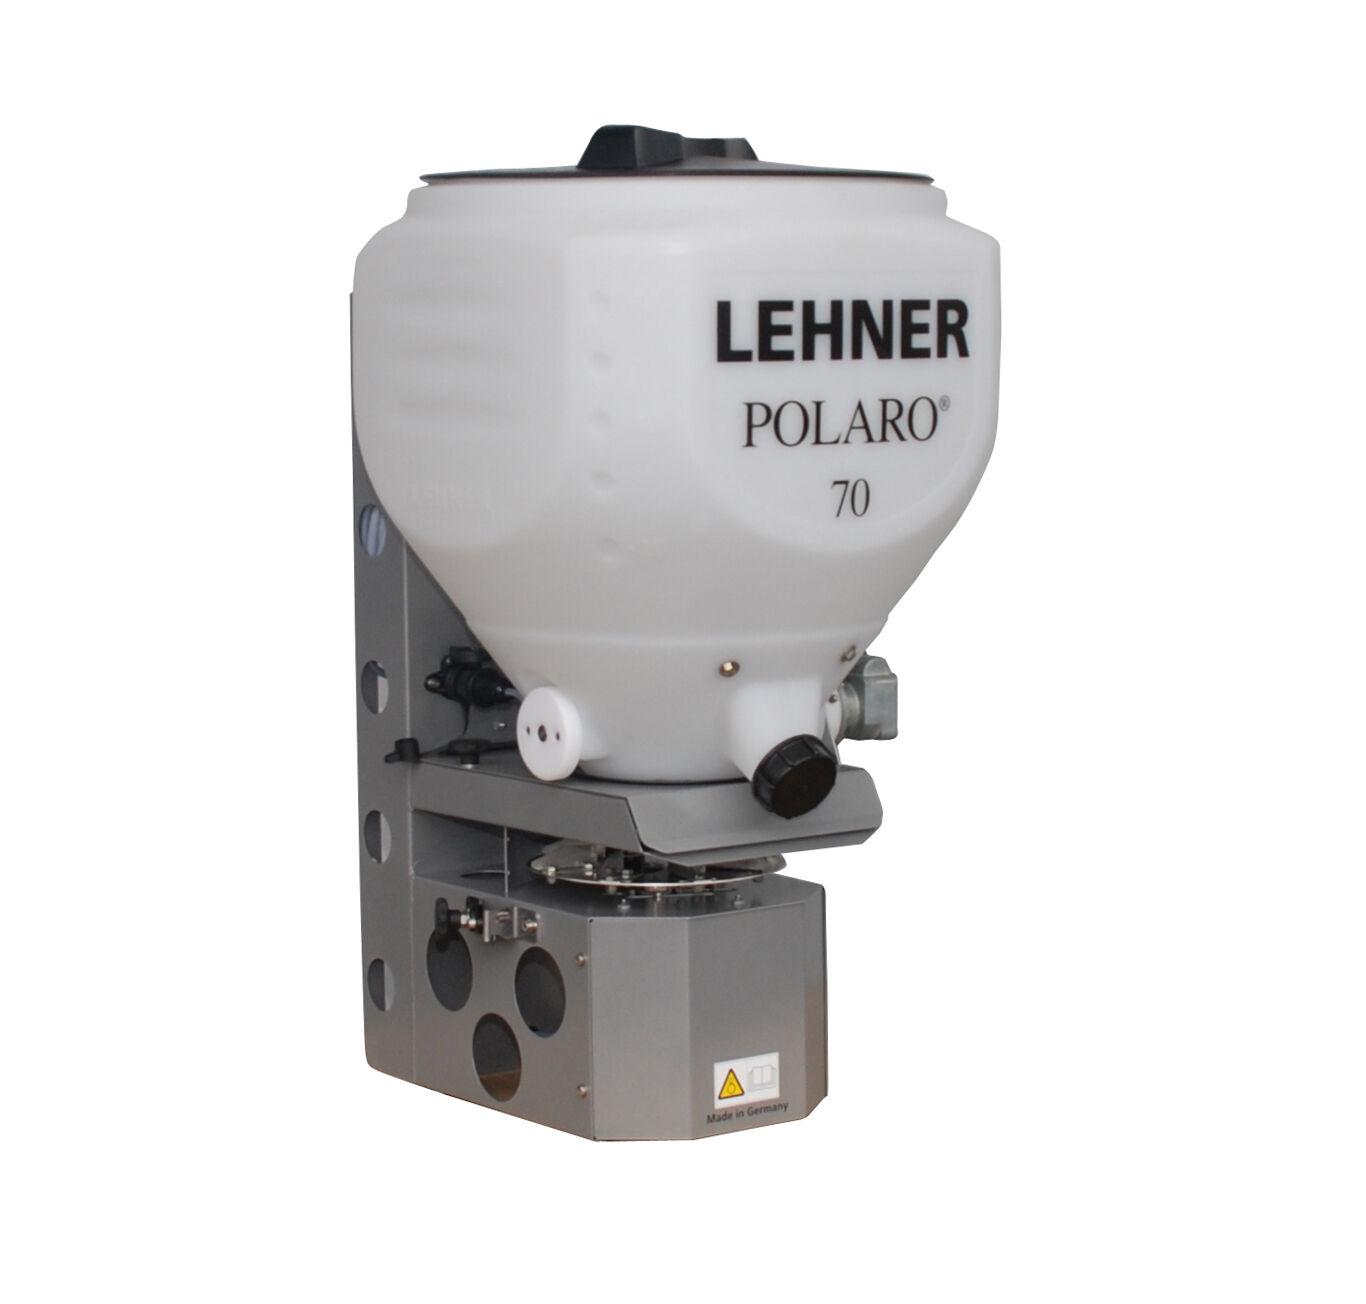 Lehner Polaro 12V Polaro 70E Streuer Winterdienst Elektrostreuer, Quad, Radlader